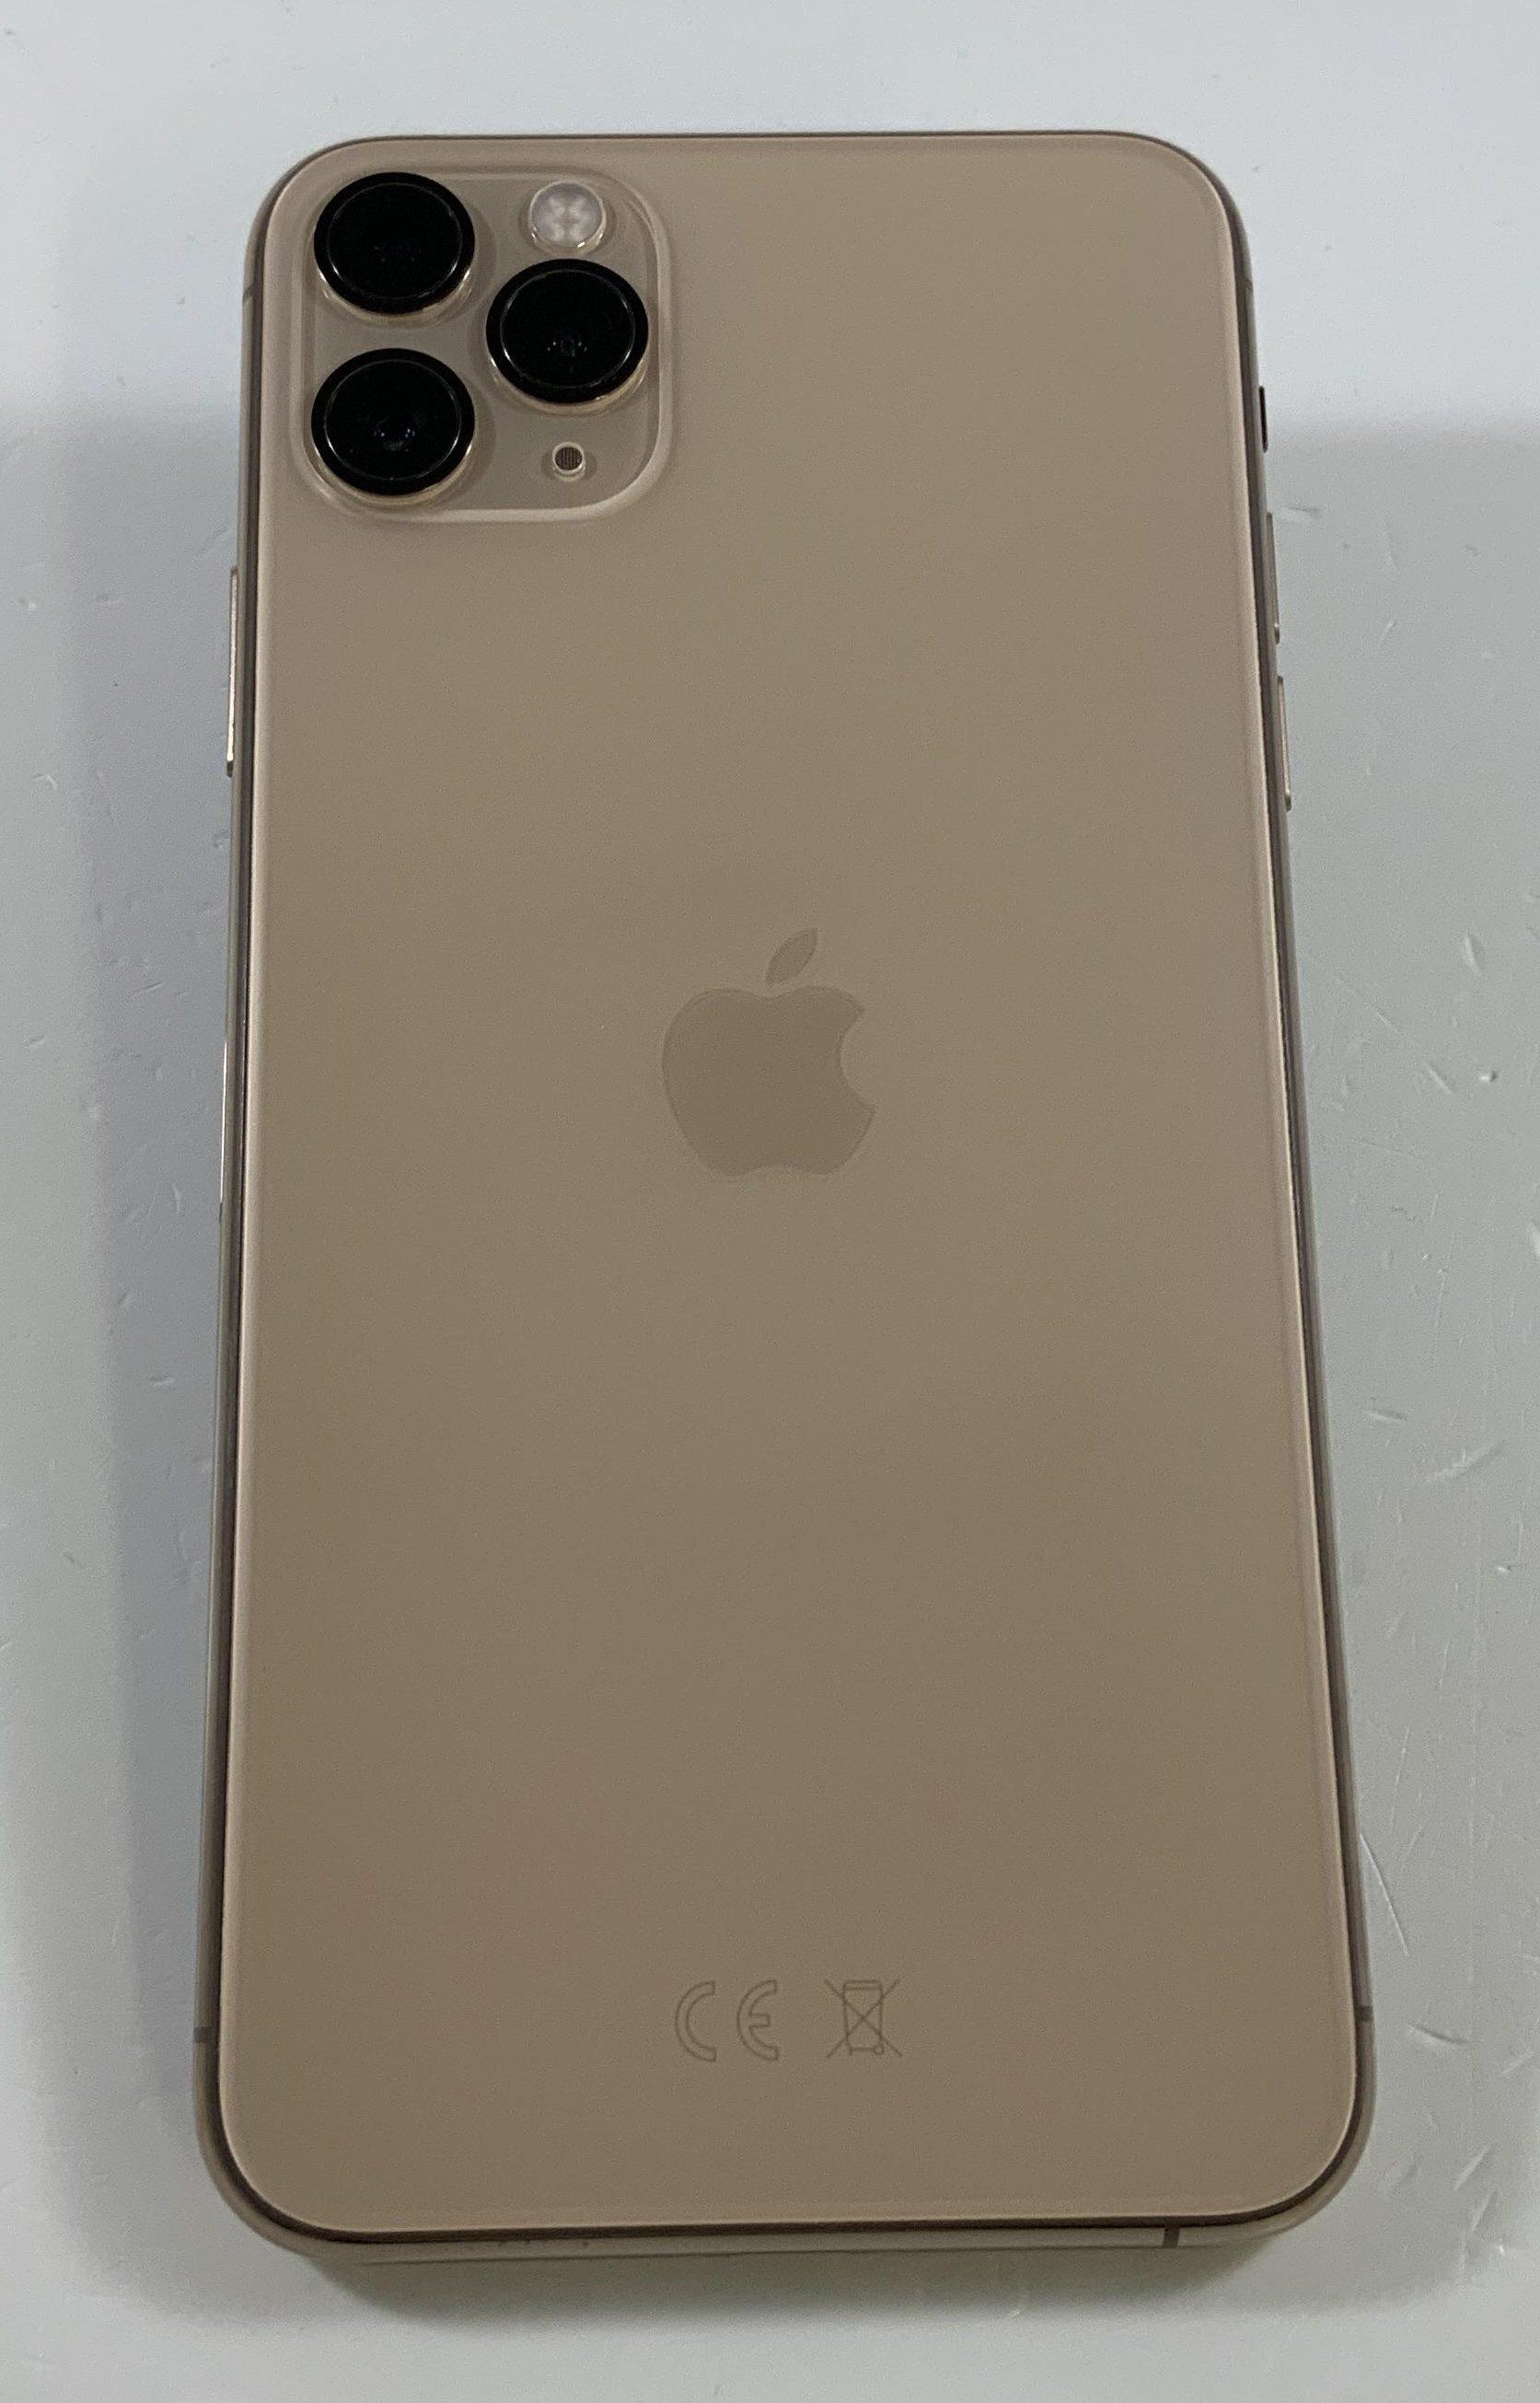 iPhone 11 Pro Max 64GB, 64GB, Gold, image 2